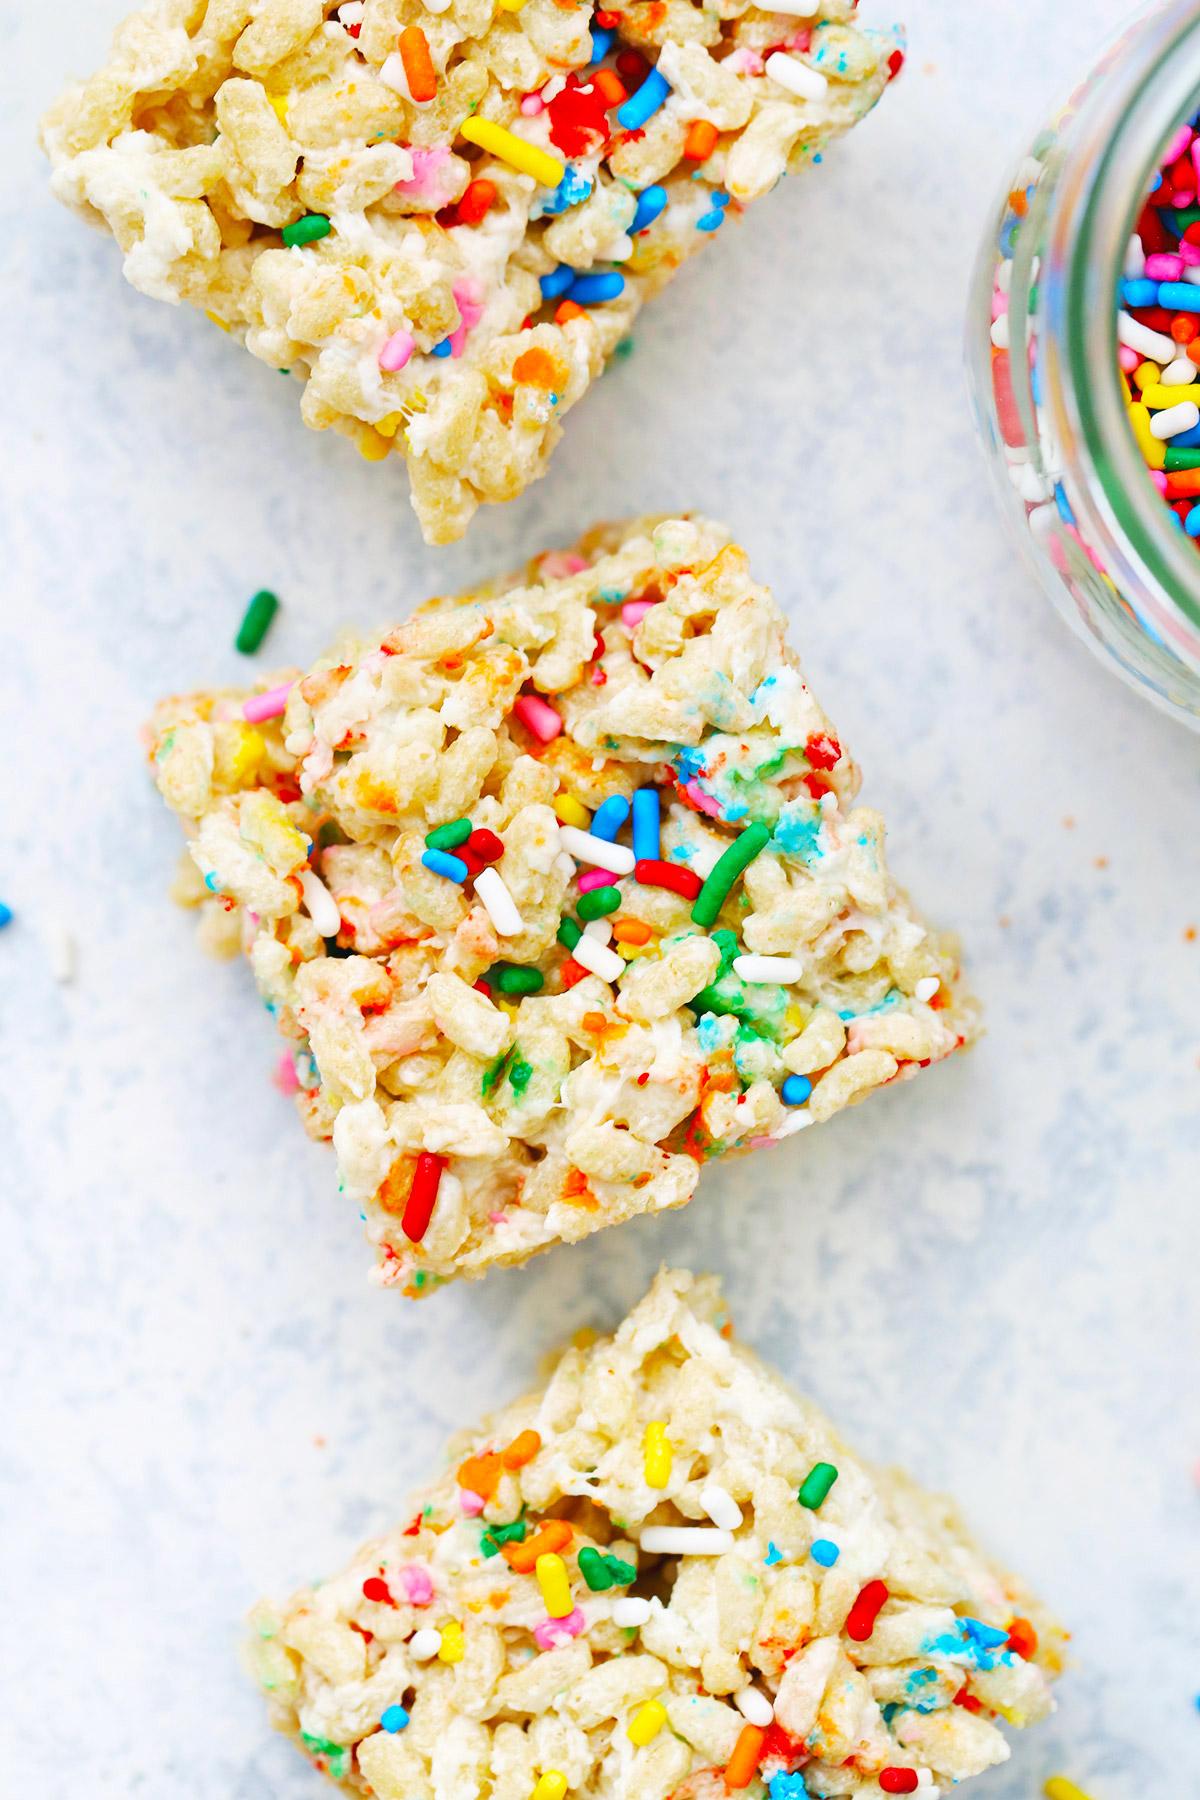 Funfetti Birthday Cake Rice Krispies Treats Gluten Free Vegan One Lovely Life